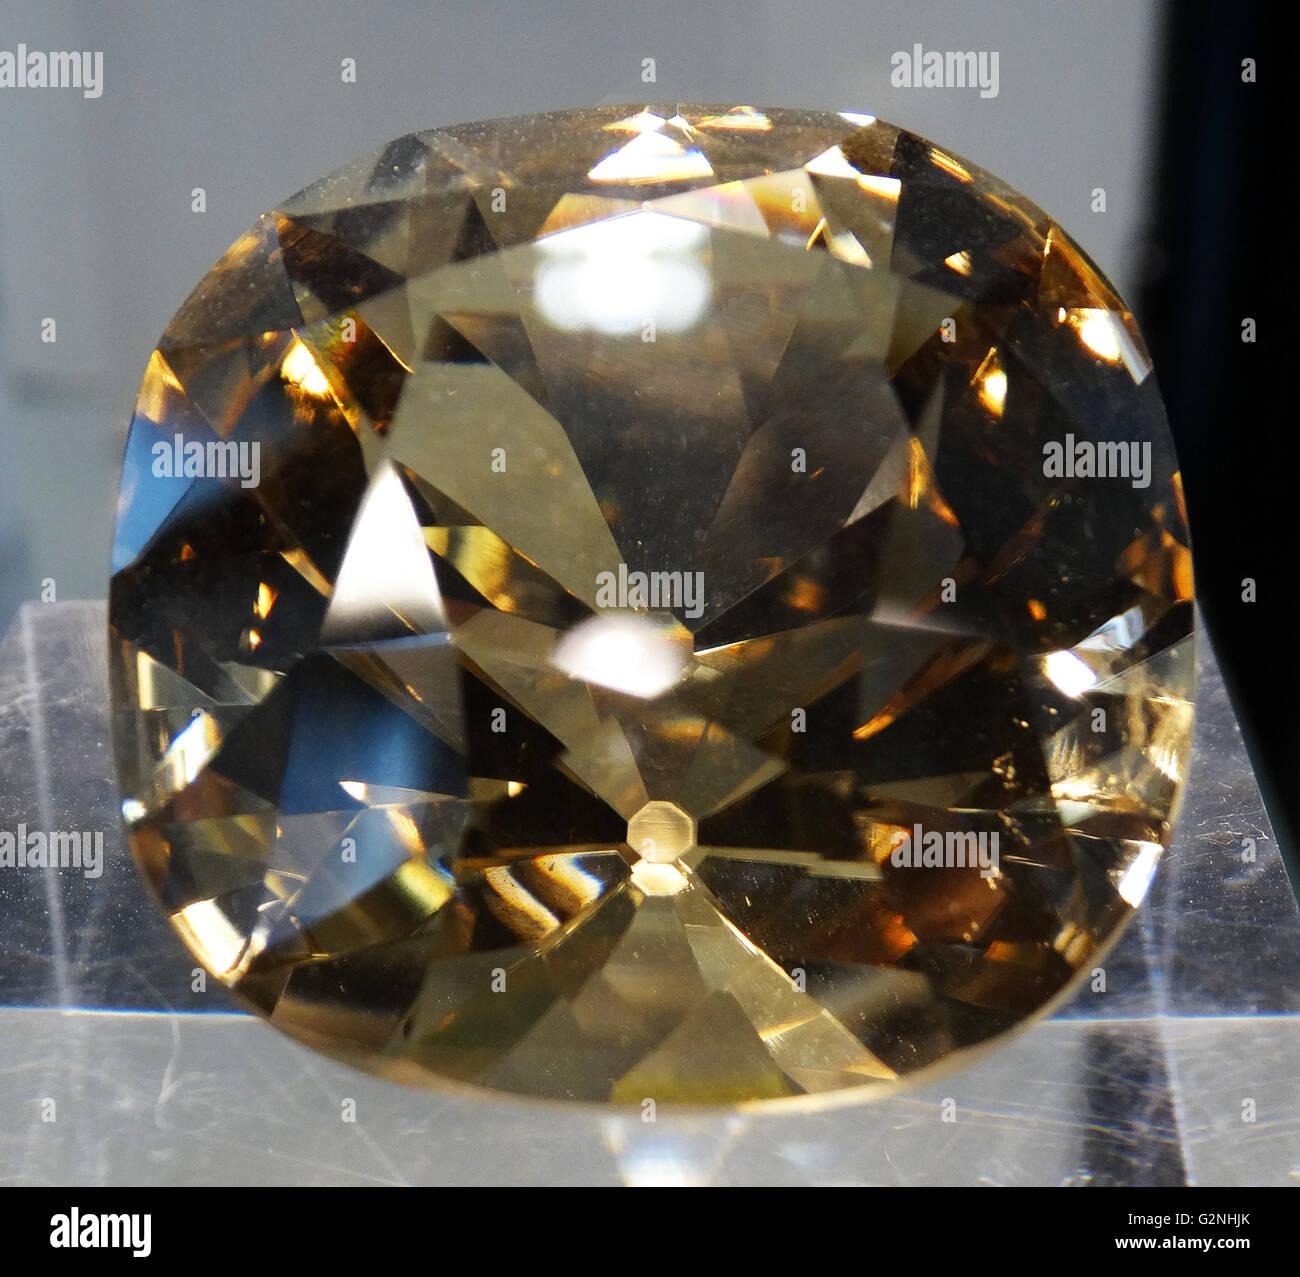 Giallo De Beers Diamond Immagini Stock